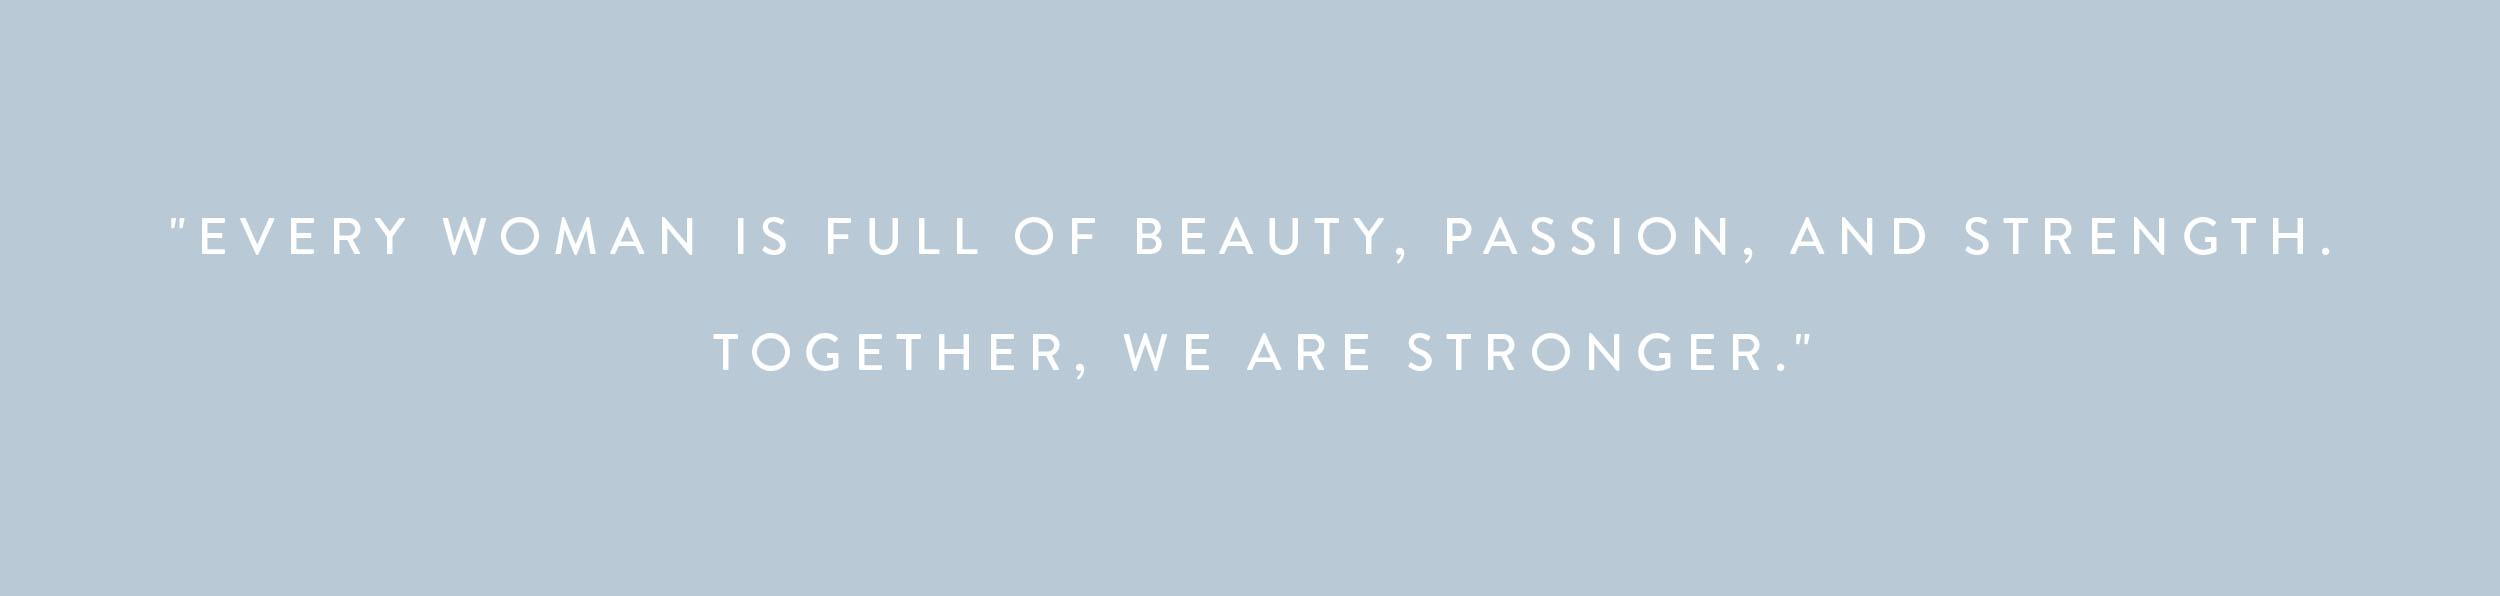 KendraScott-InternationalWomensDay